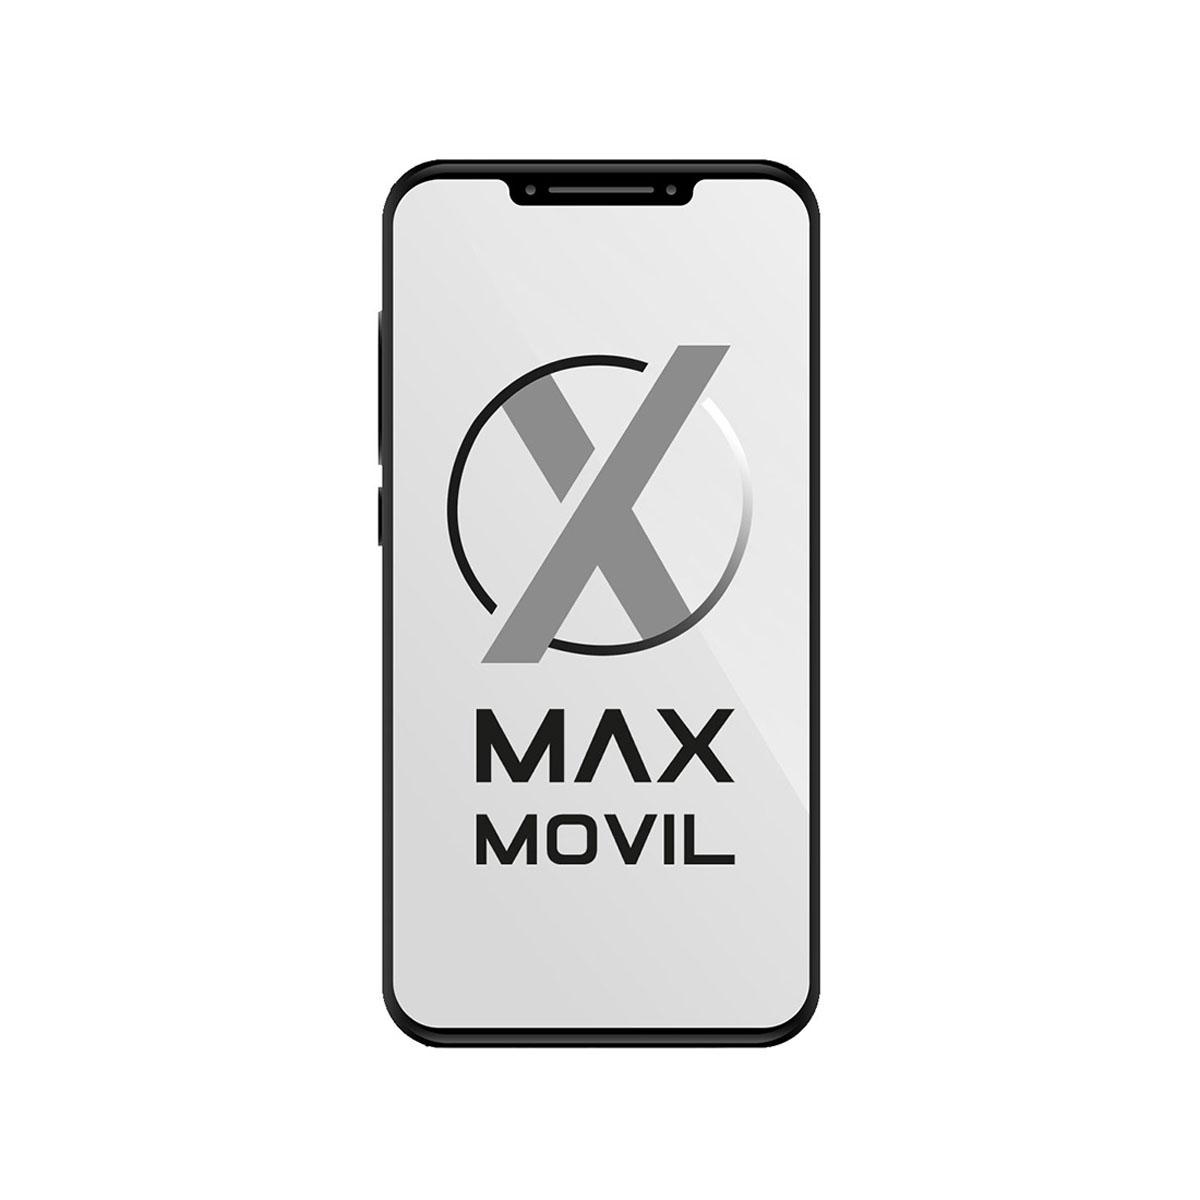 Auriculares Sony MDRZX110-B negros plegables